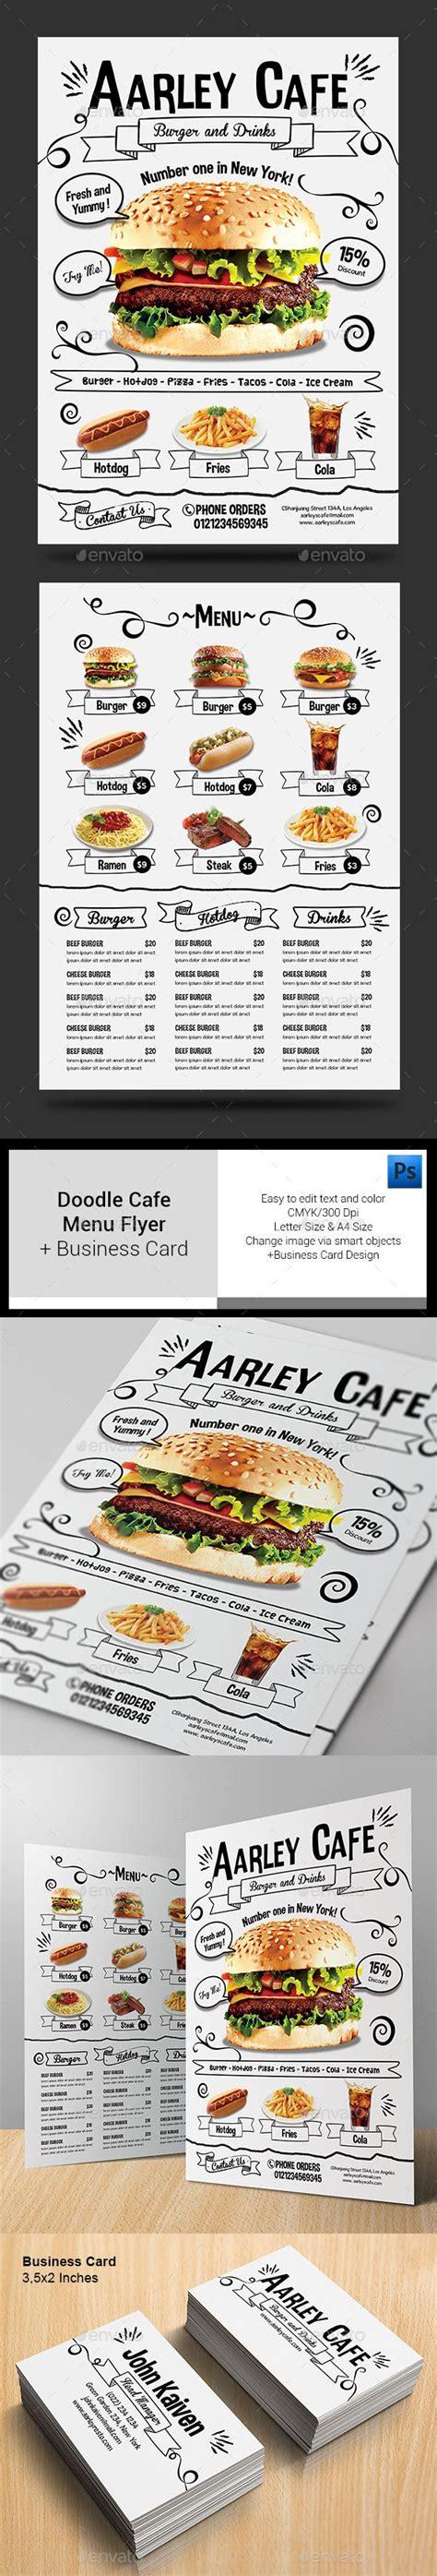 1000 ideas about menu cards on pinterest diy wedding restaurant interior design software free download